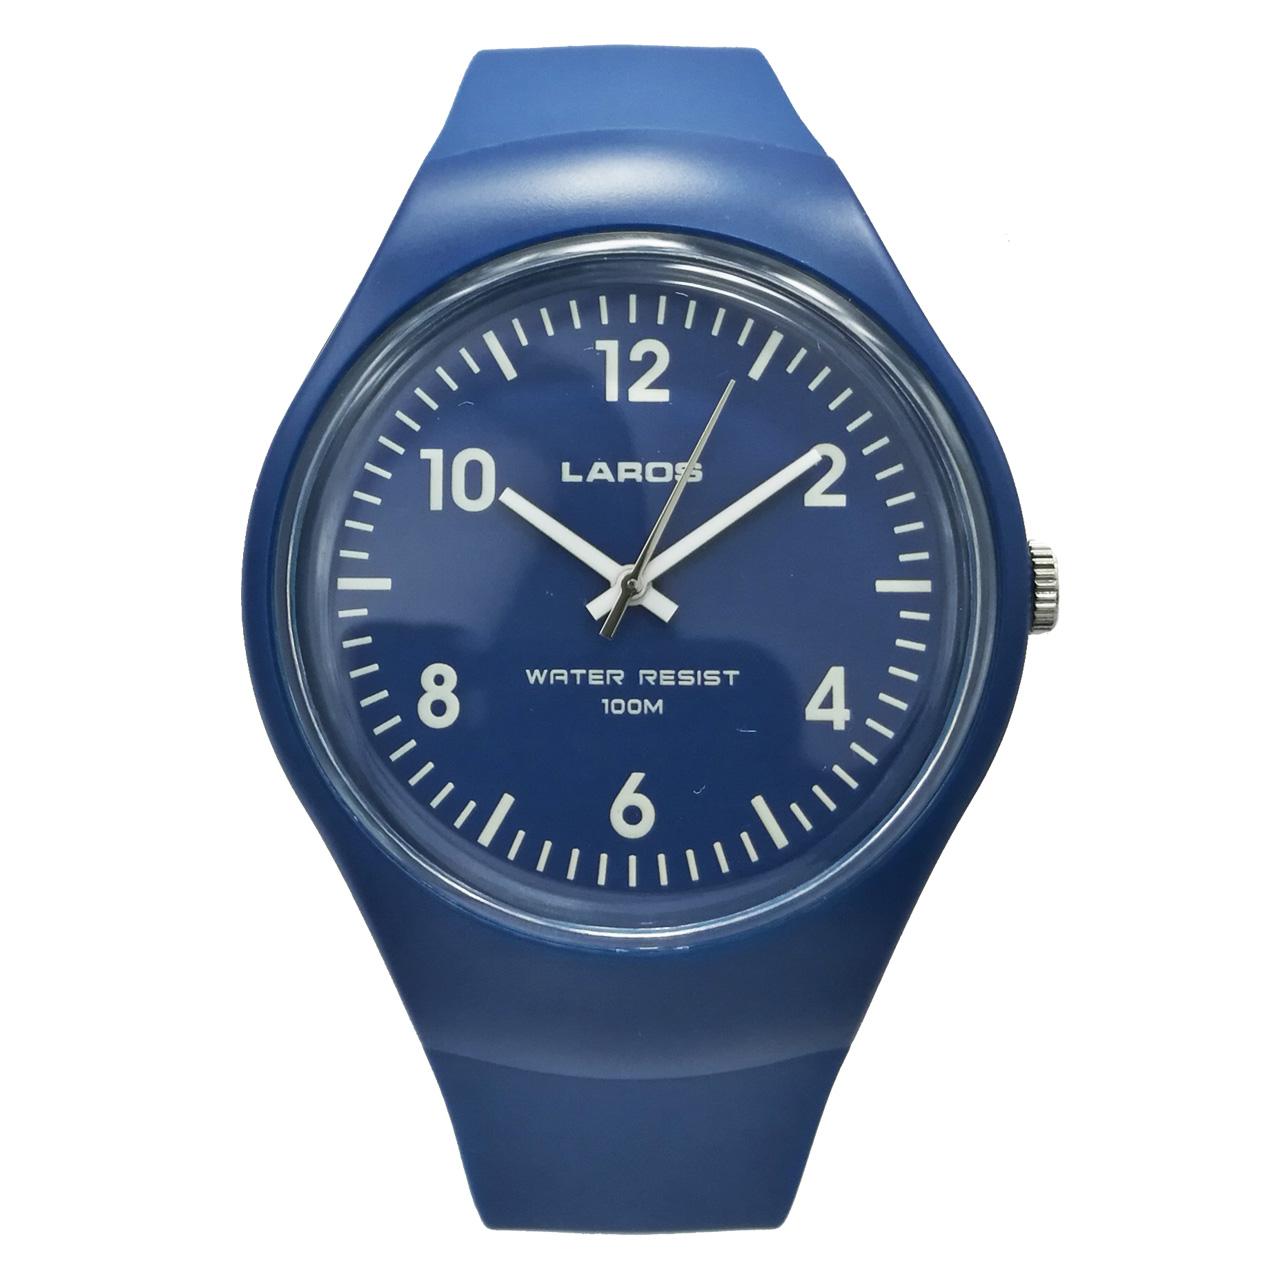 ساعت مچی عقربه ای لاروس مدل 1117-aq1066a 15